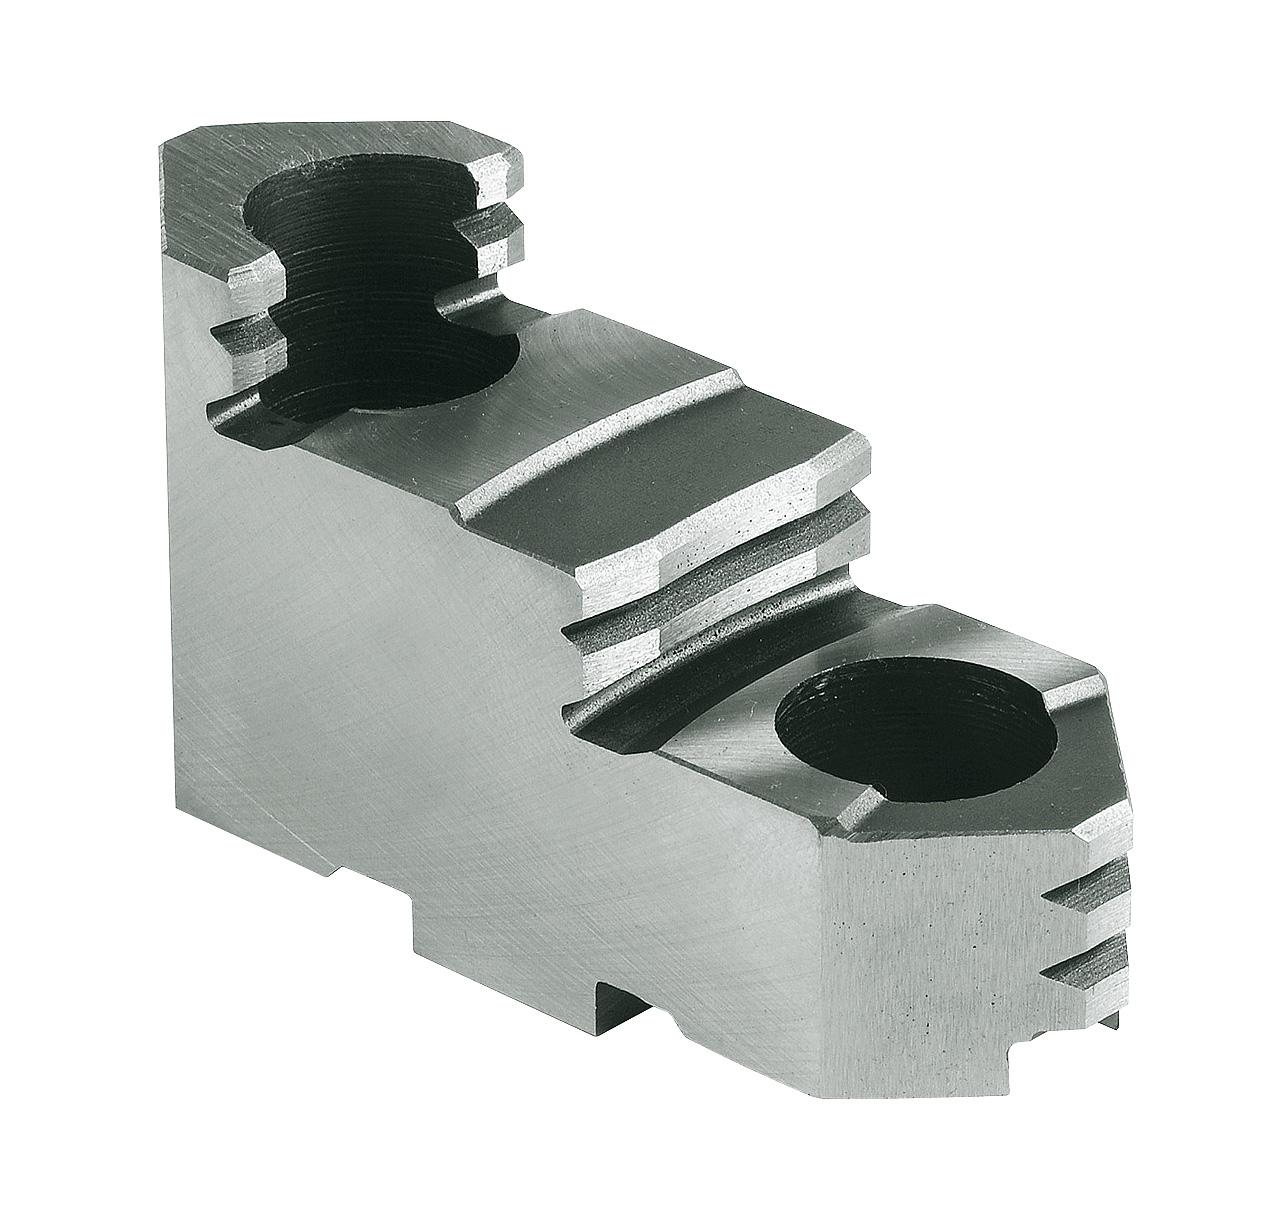 Szczęki górne twarde - komplet DTJ-DK11-200 BERNARDO